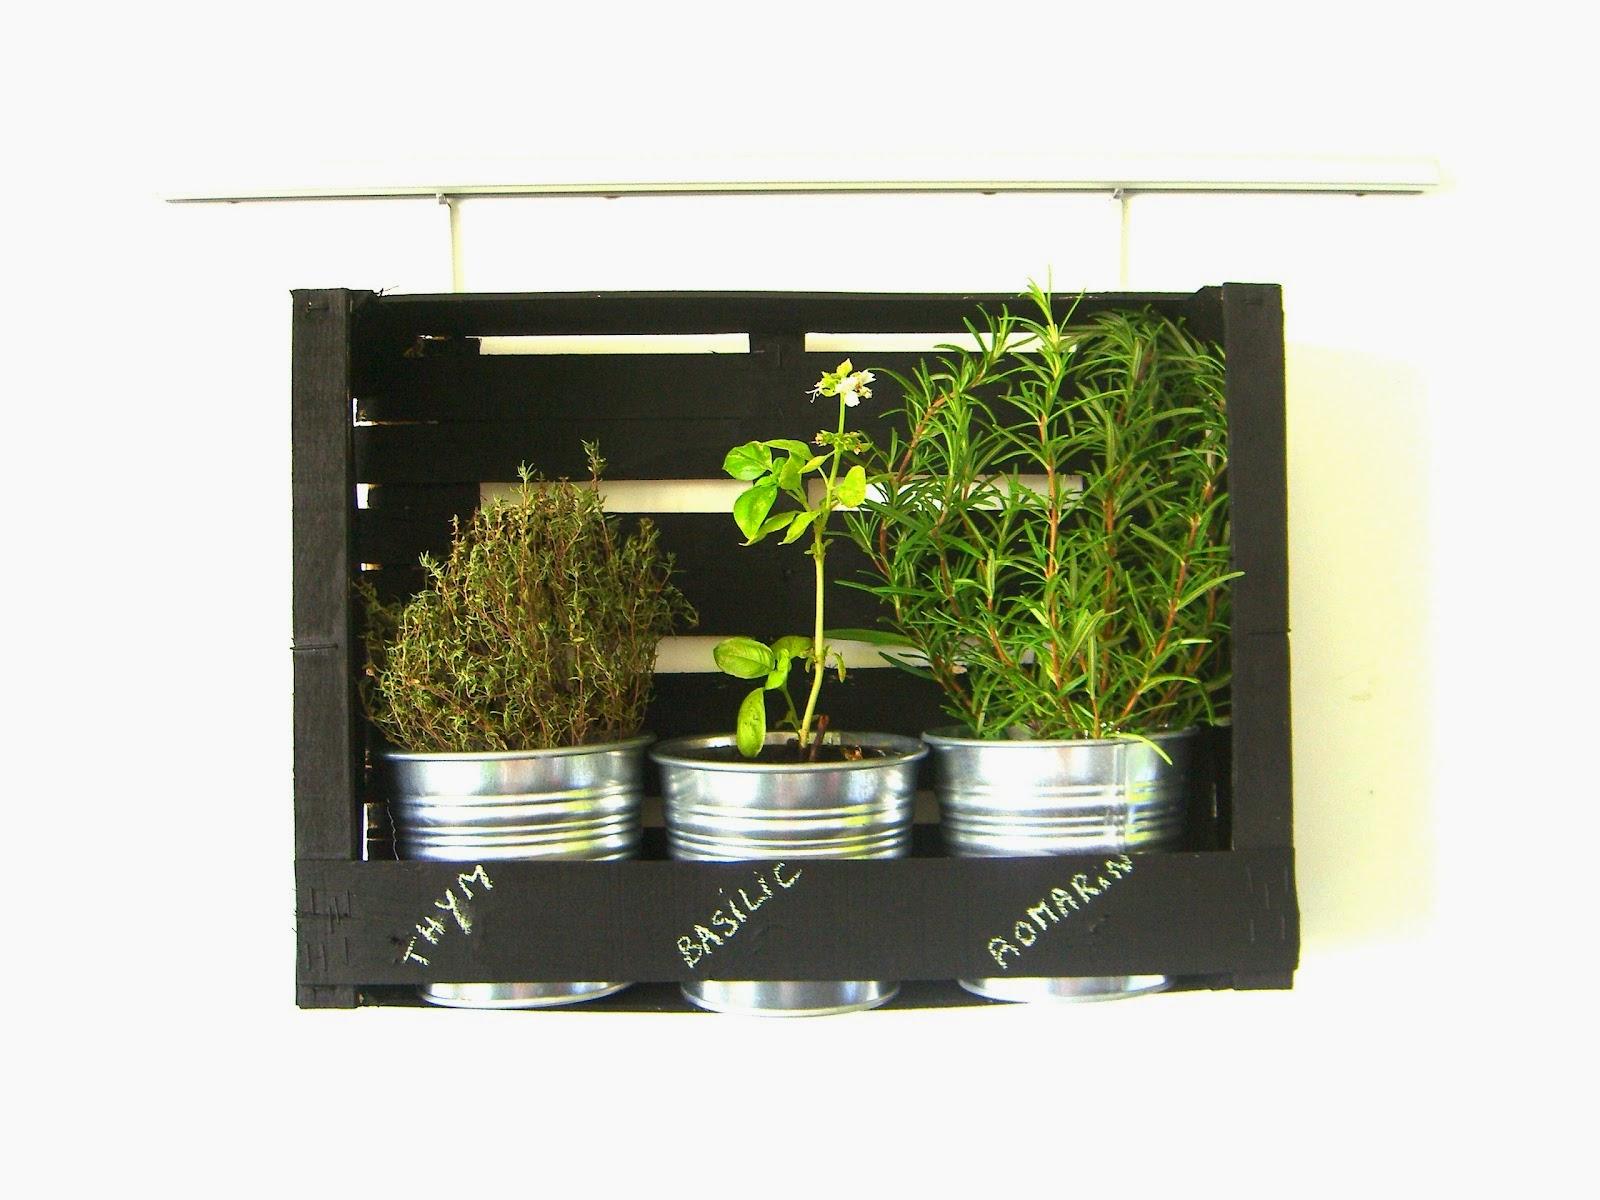 les herbes aromatiques en cuisine les herbes aromatiques with les herbes aromatiques en cuisine. Black Bedroom Furniture Sets. Home Design Ideas